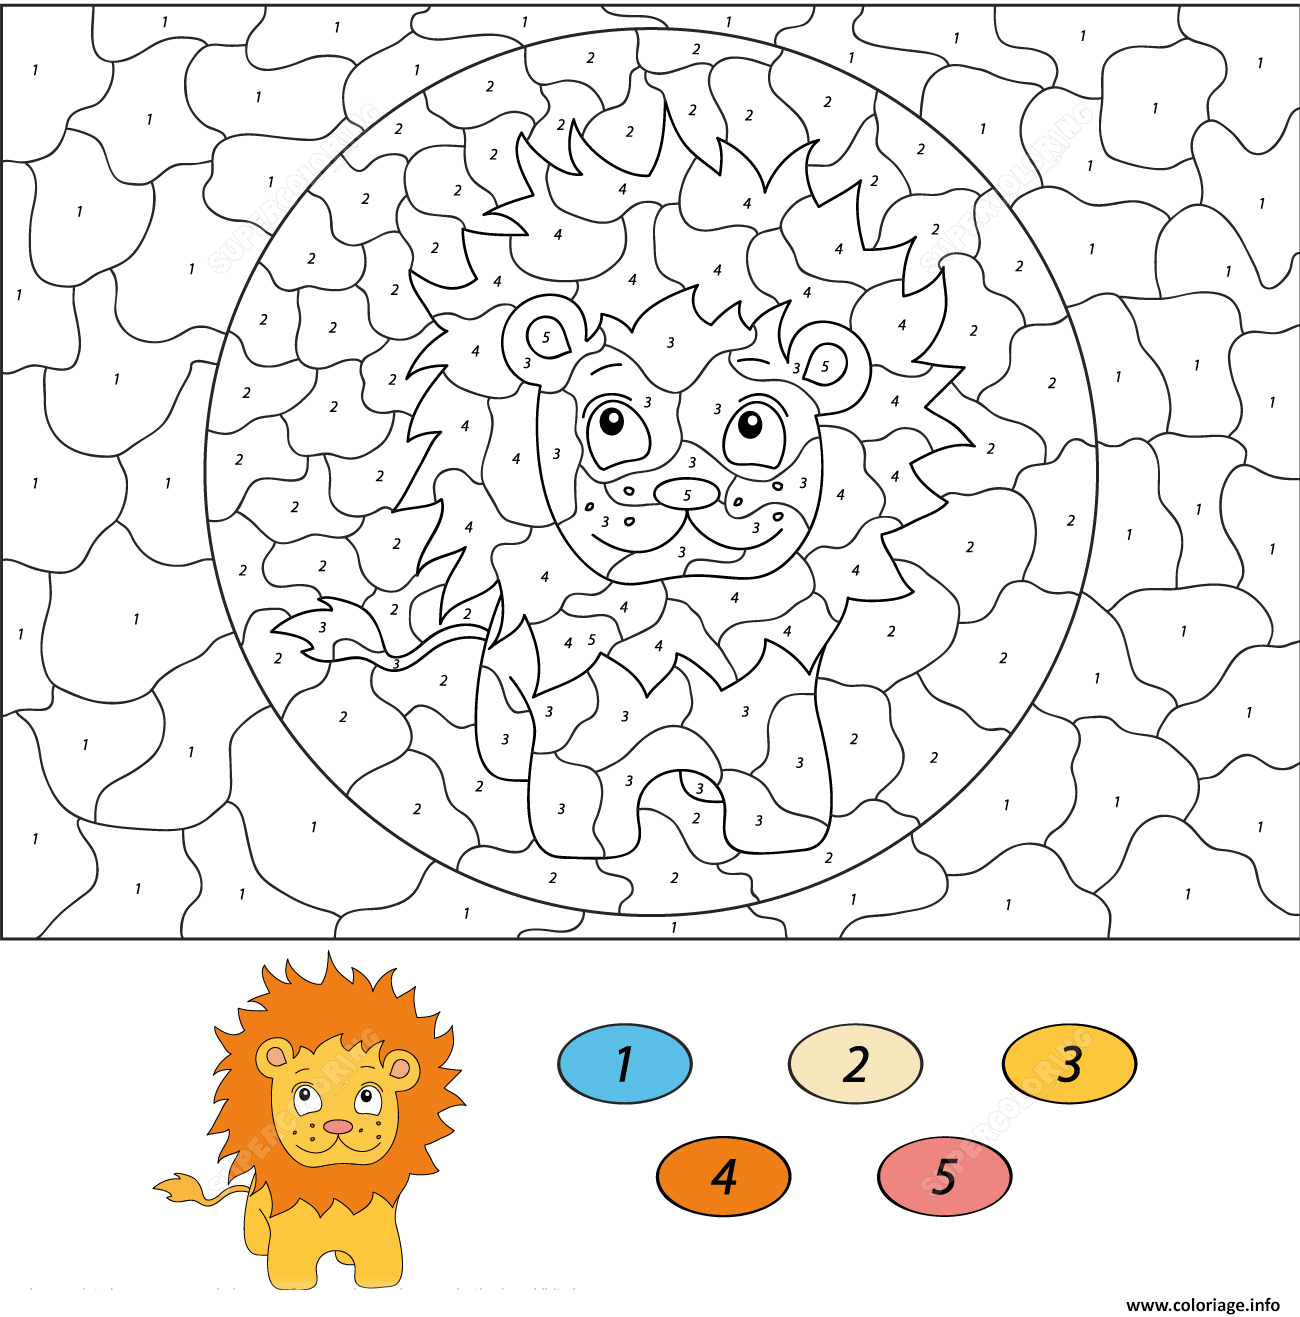 Coloriage Cartoon Lion Magique Dessin